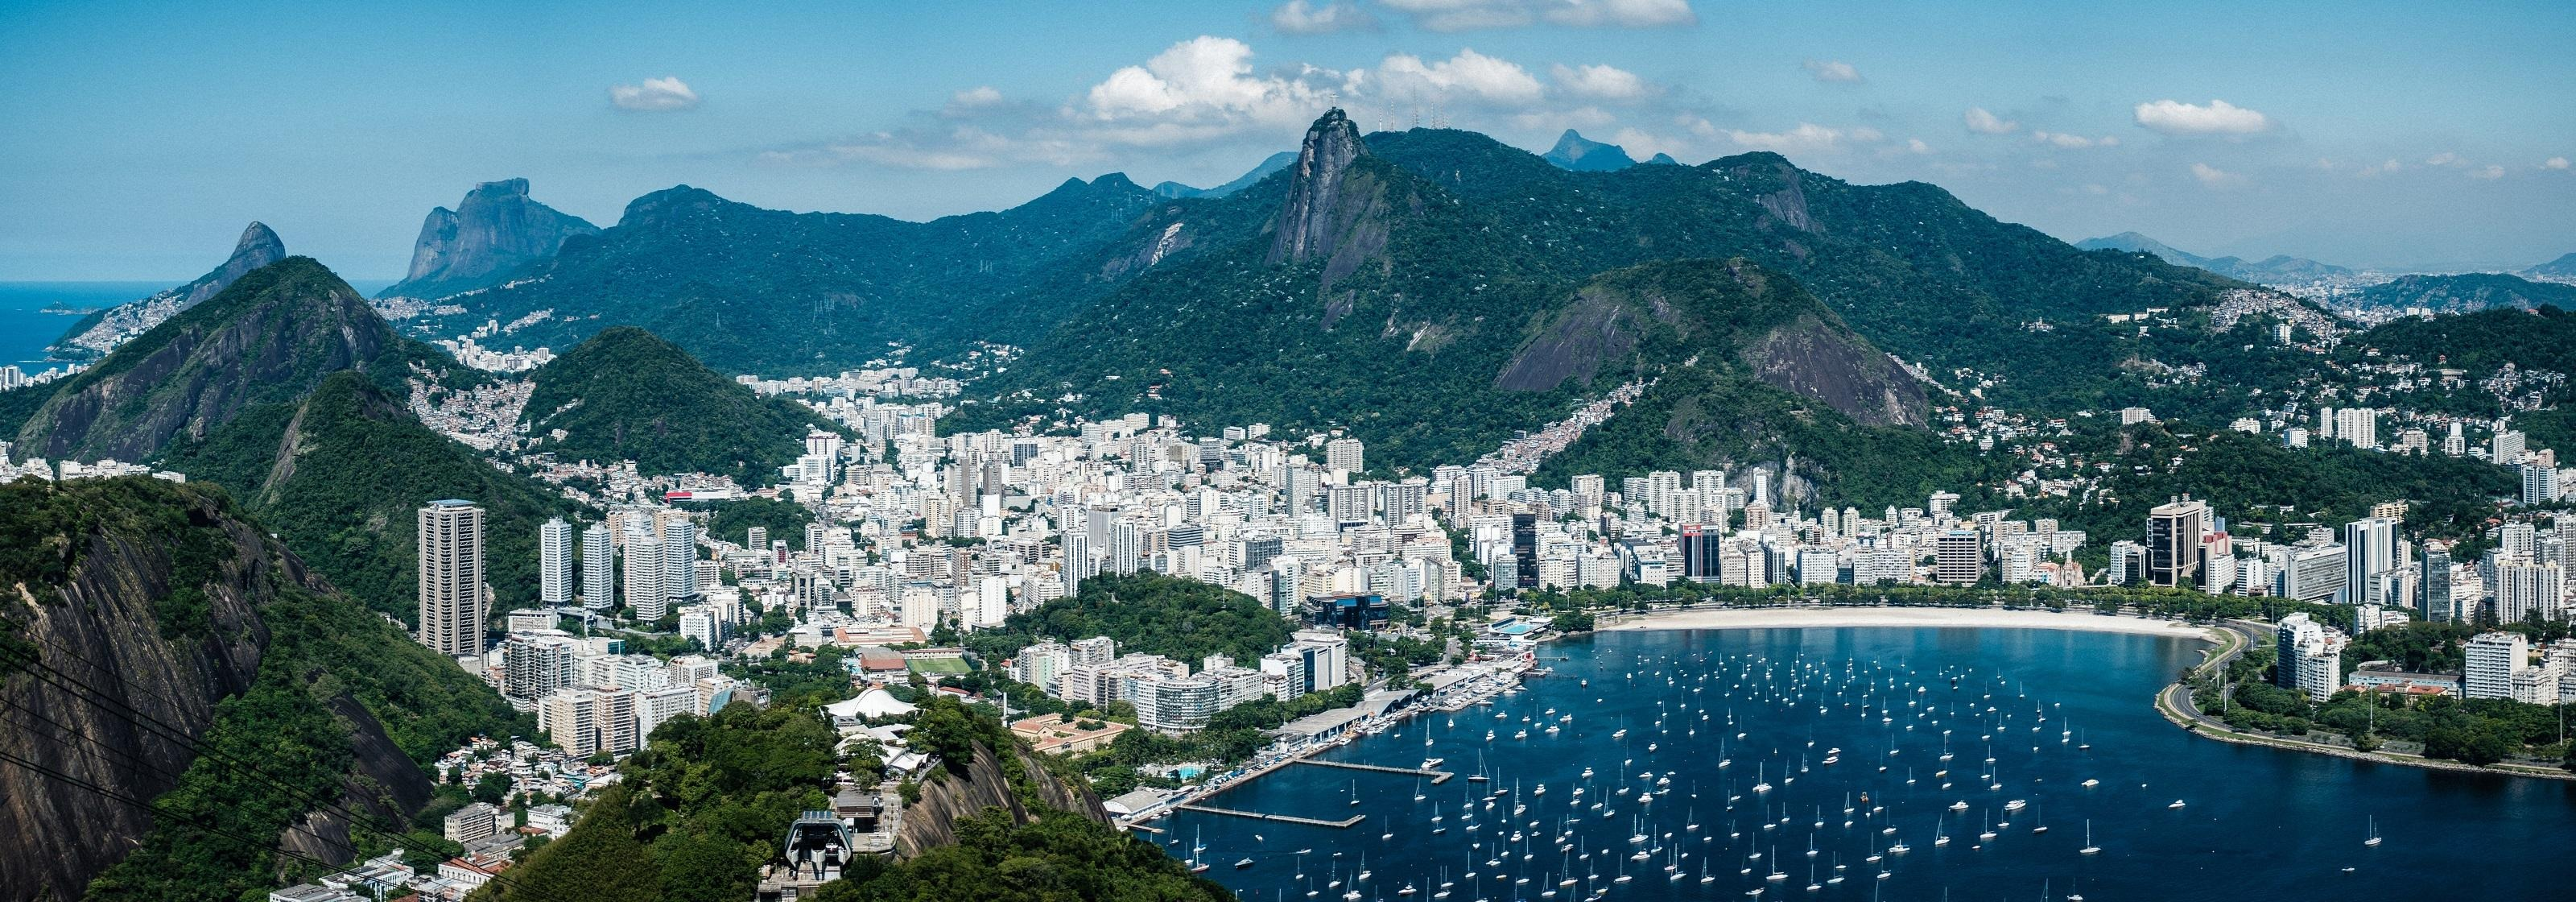 Aktivitäten in Rio de Janeiro